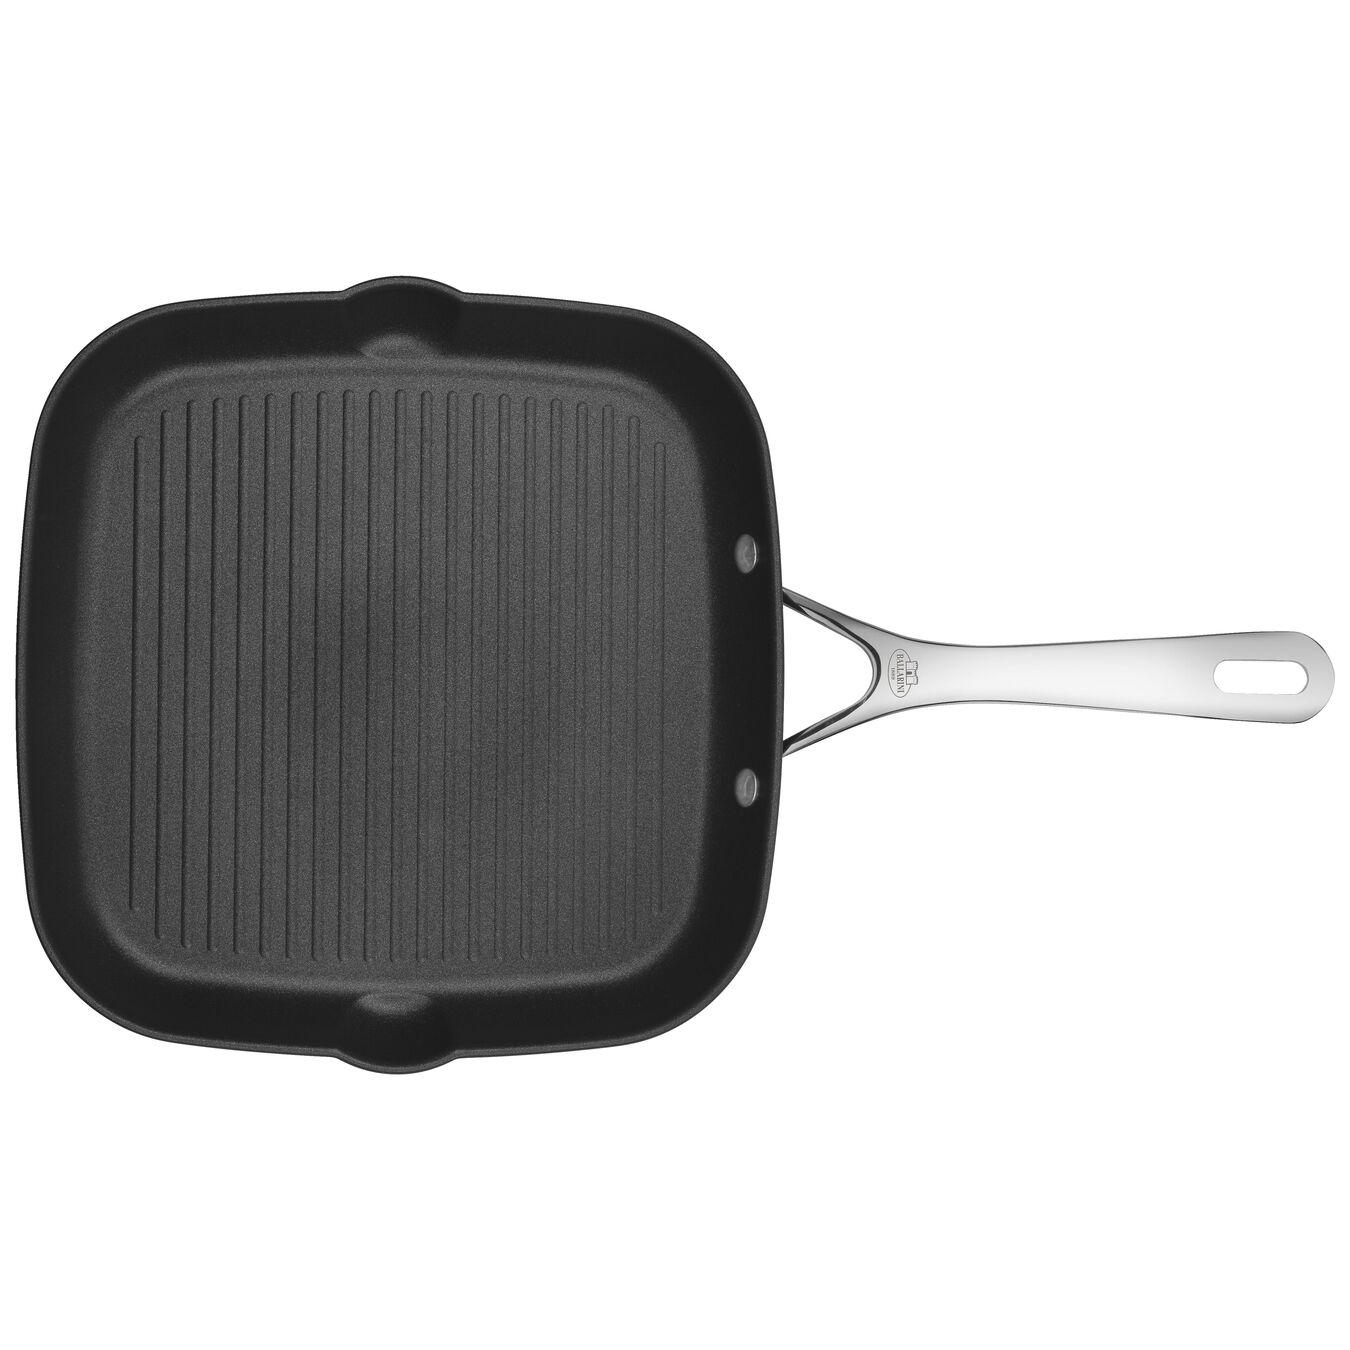 28 cm / 11 inch Aluminum round Grill pan, Black,,large 1